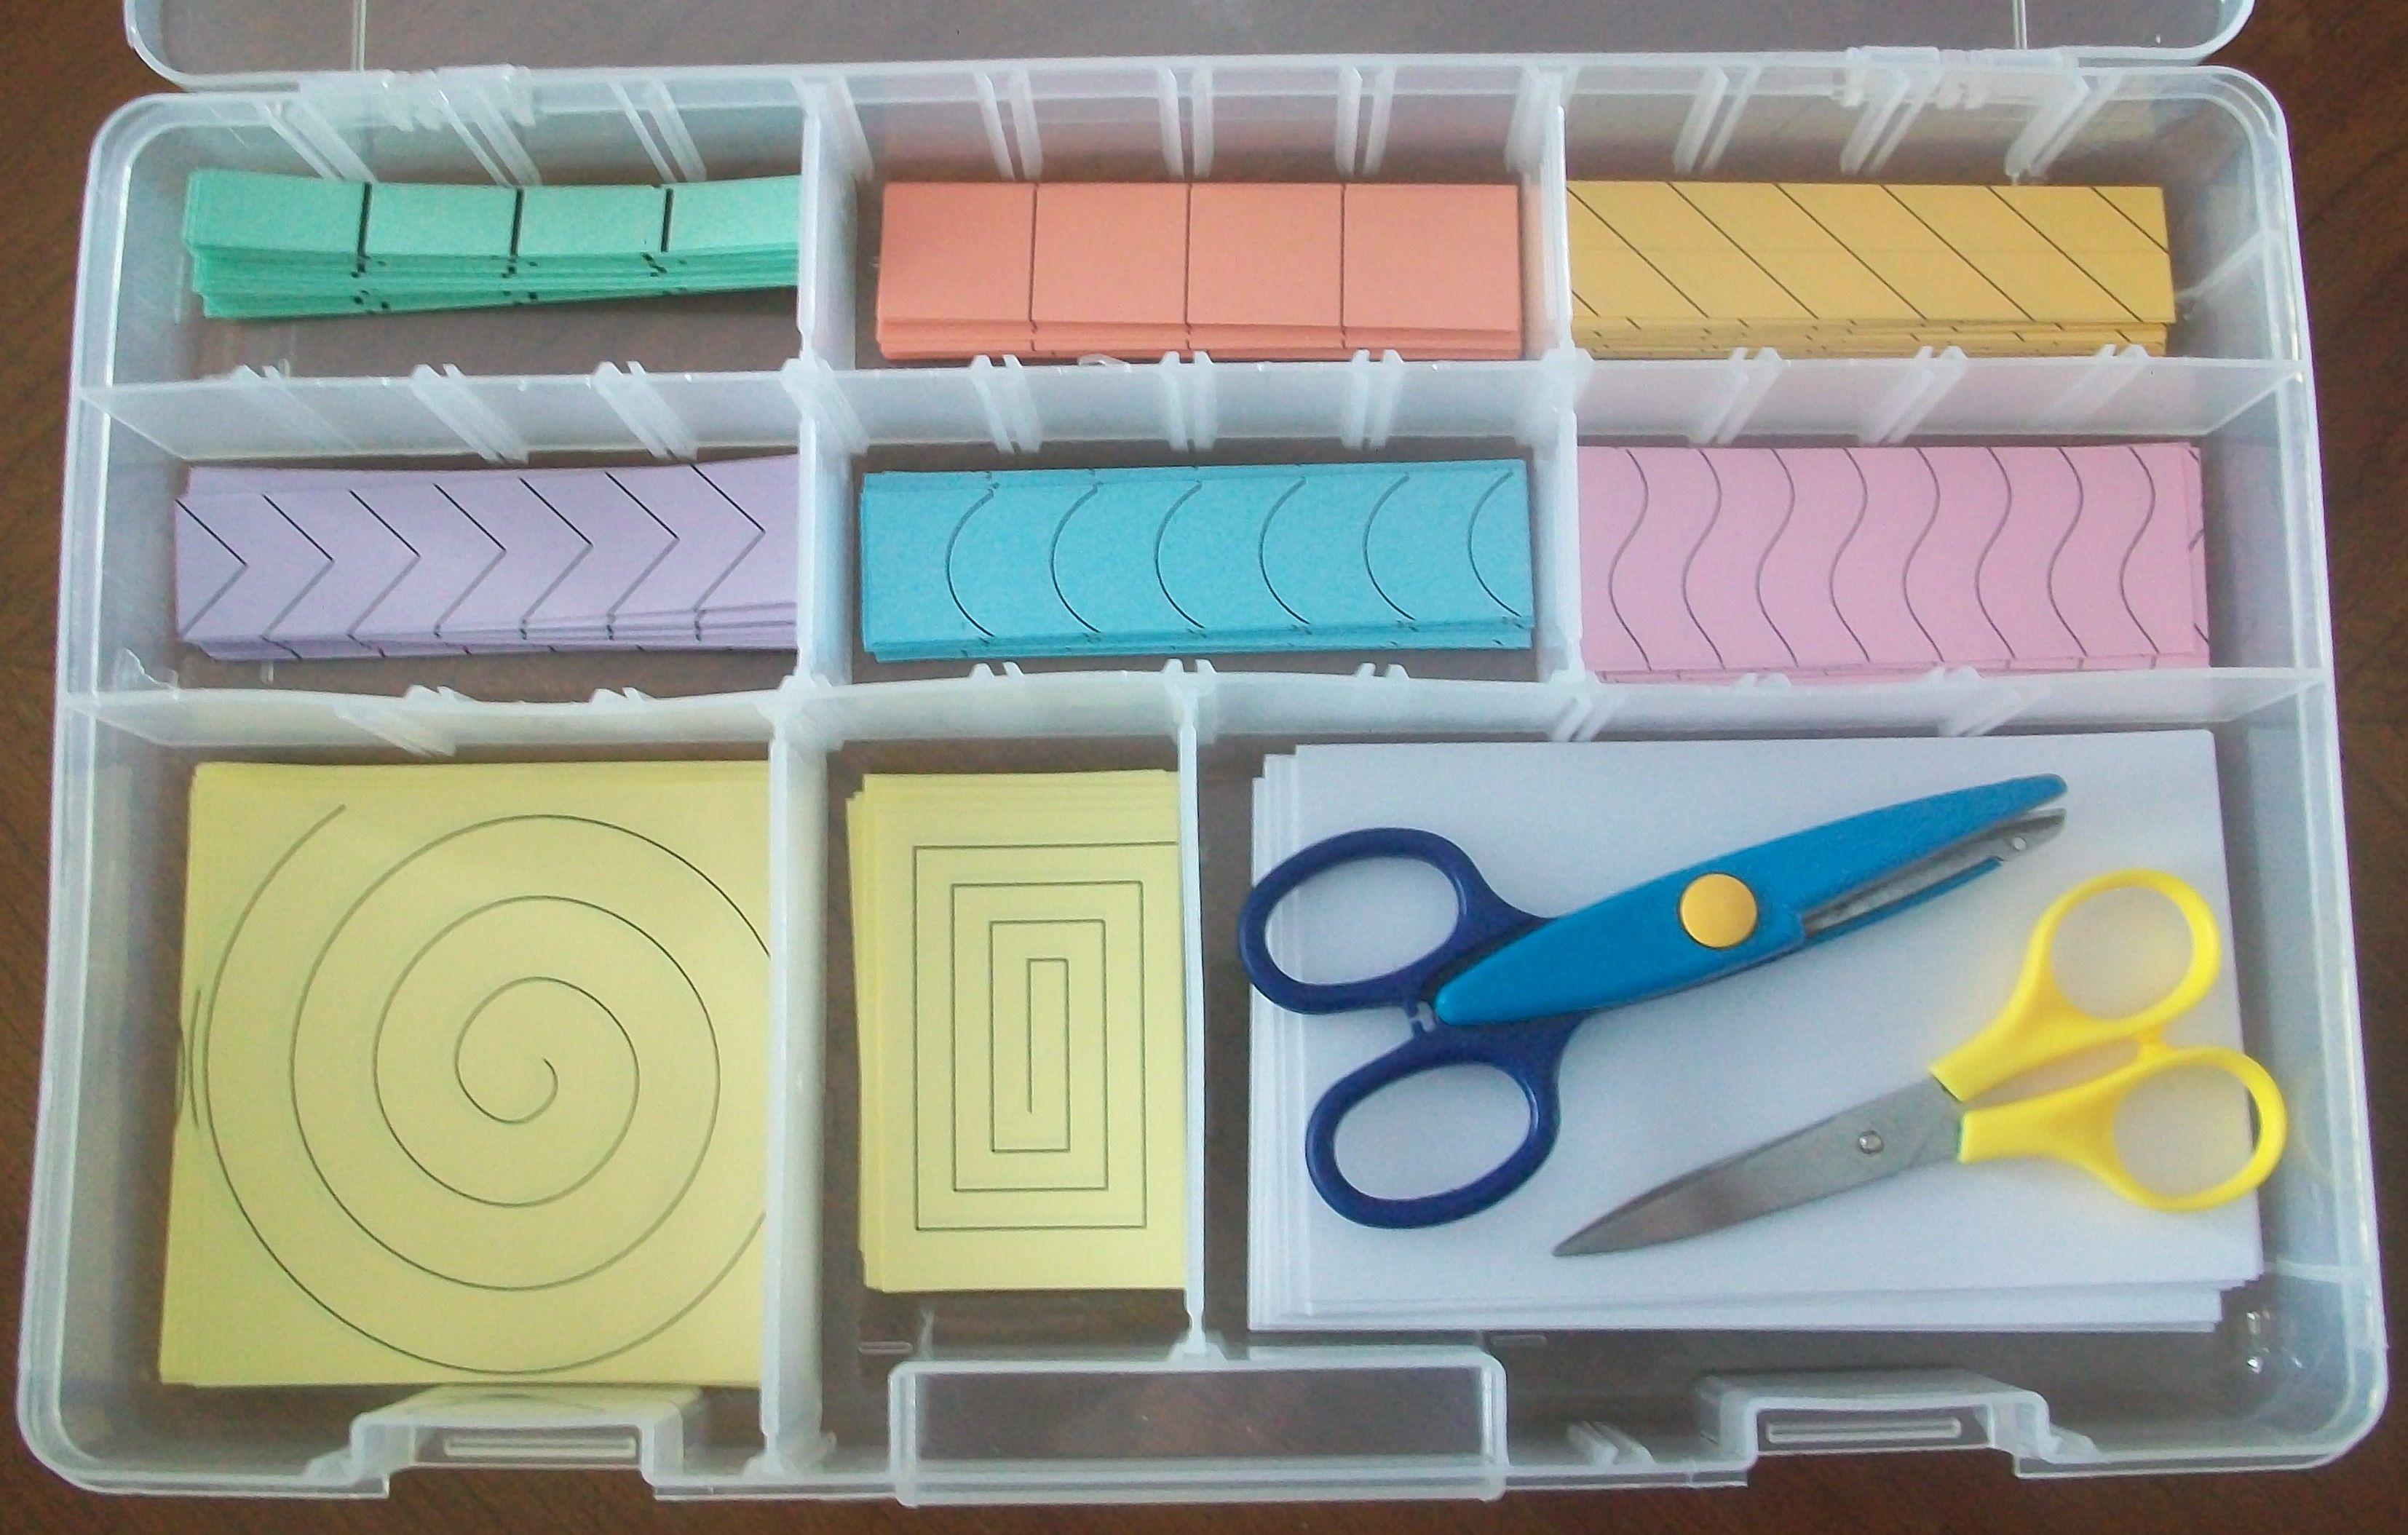 Montessori Practical Life Kit For Scissors Work To Develop Fine Motor Skills